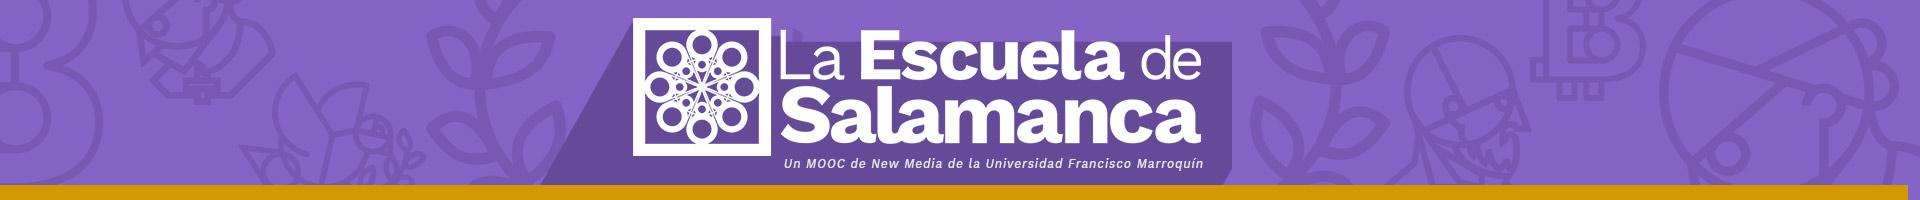 asset-v1_Estudios-iberoamericanos+SSESV1+2020+type@asset+block@header_salamanca_ESP_1920X200